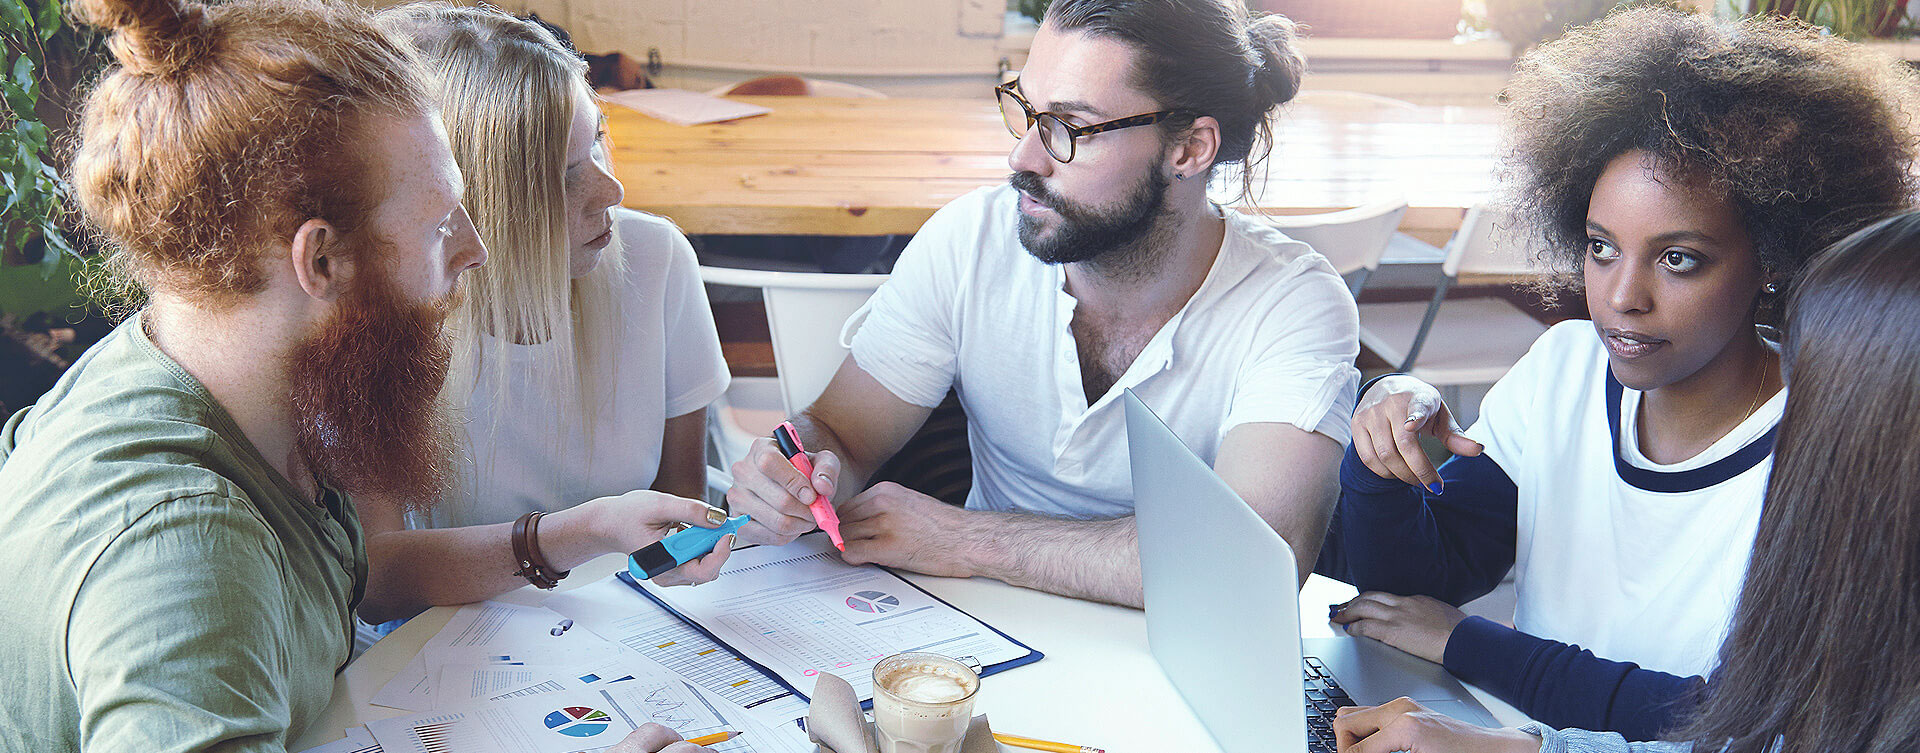 Creative Business Meeting in a Design Studio